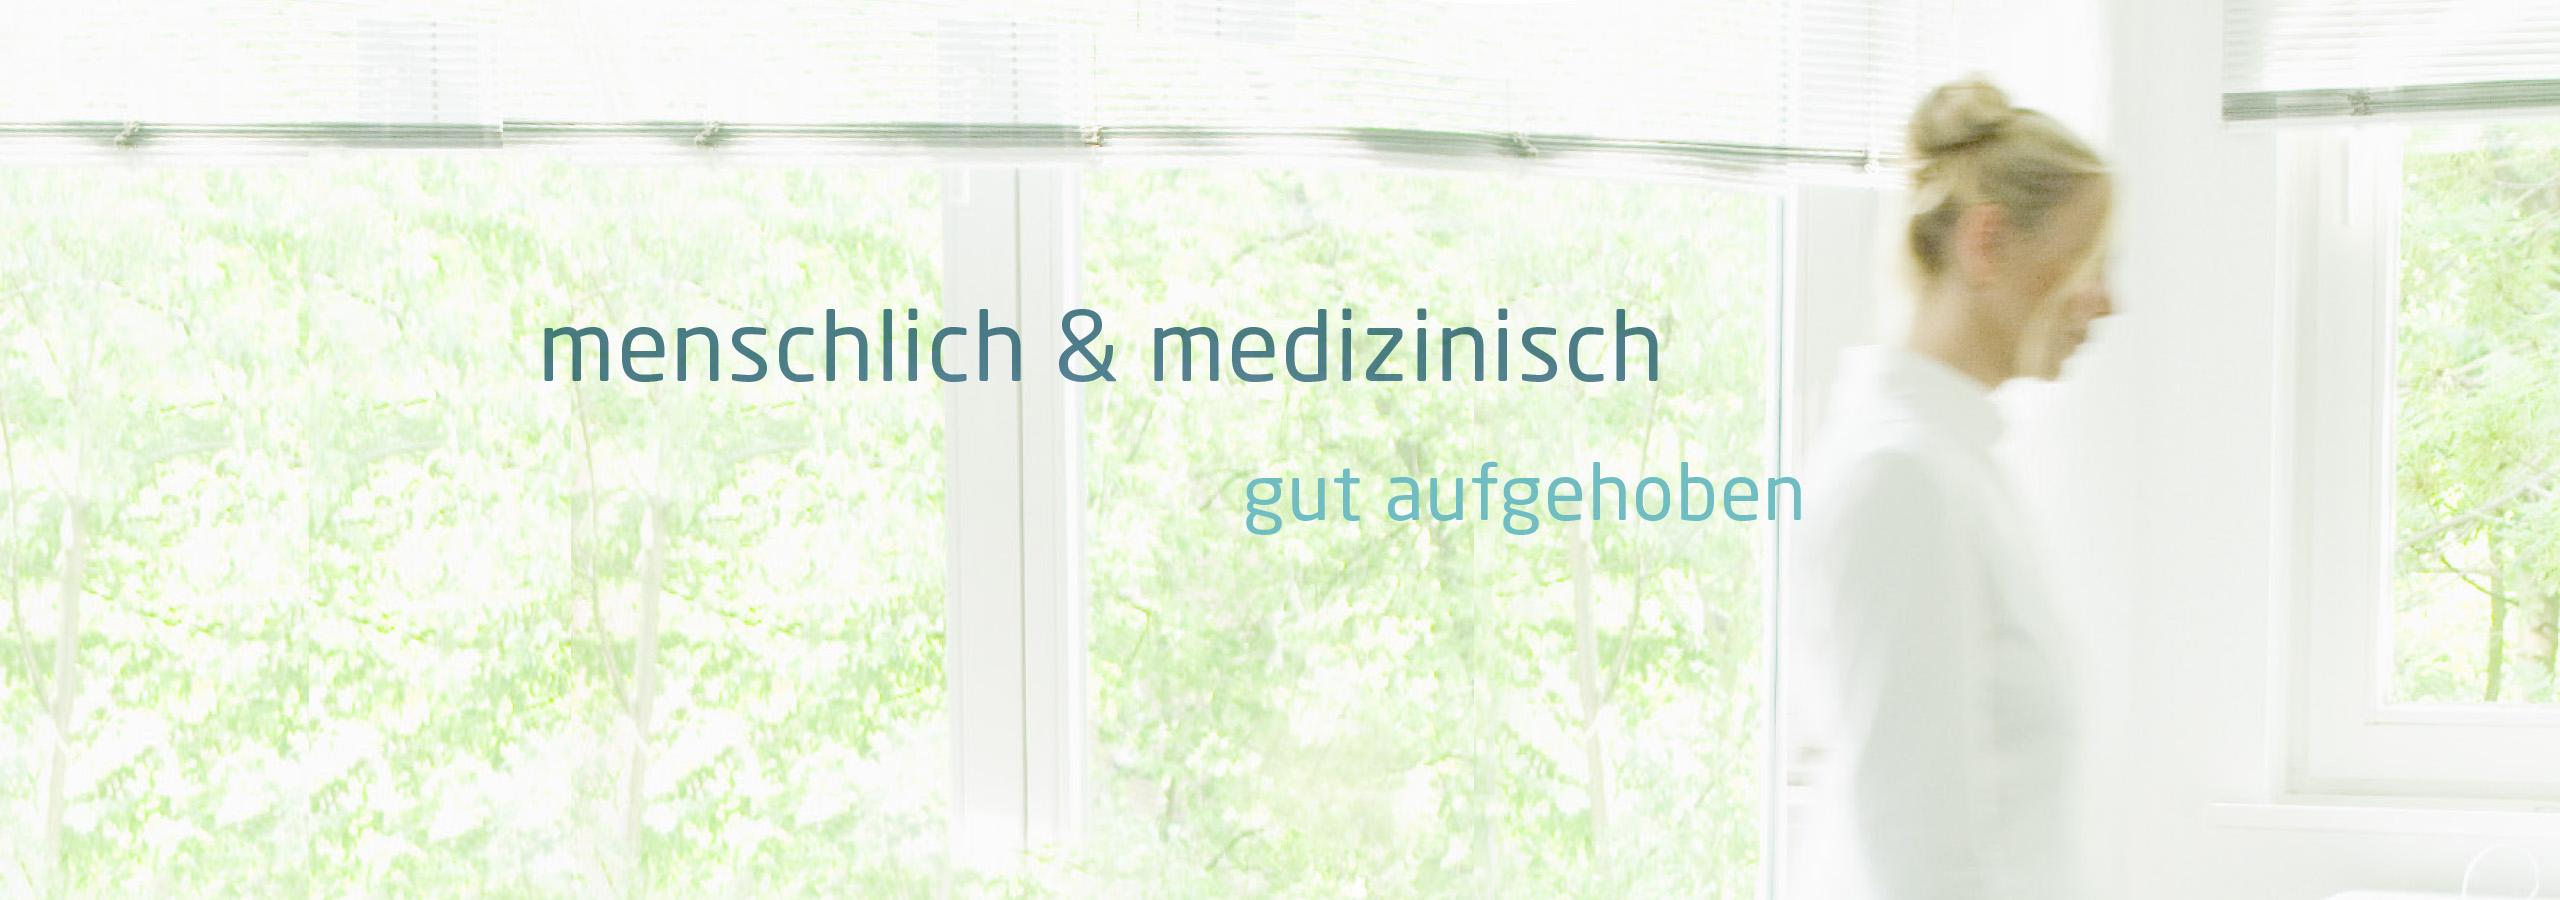 dr-sylvia-bergler-hno-bremen-klemm-design-praxis-dr-sylvia-bergler